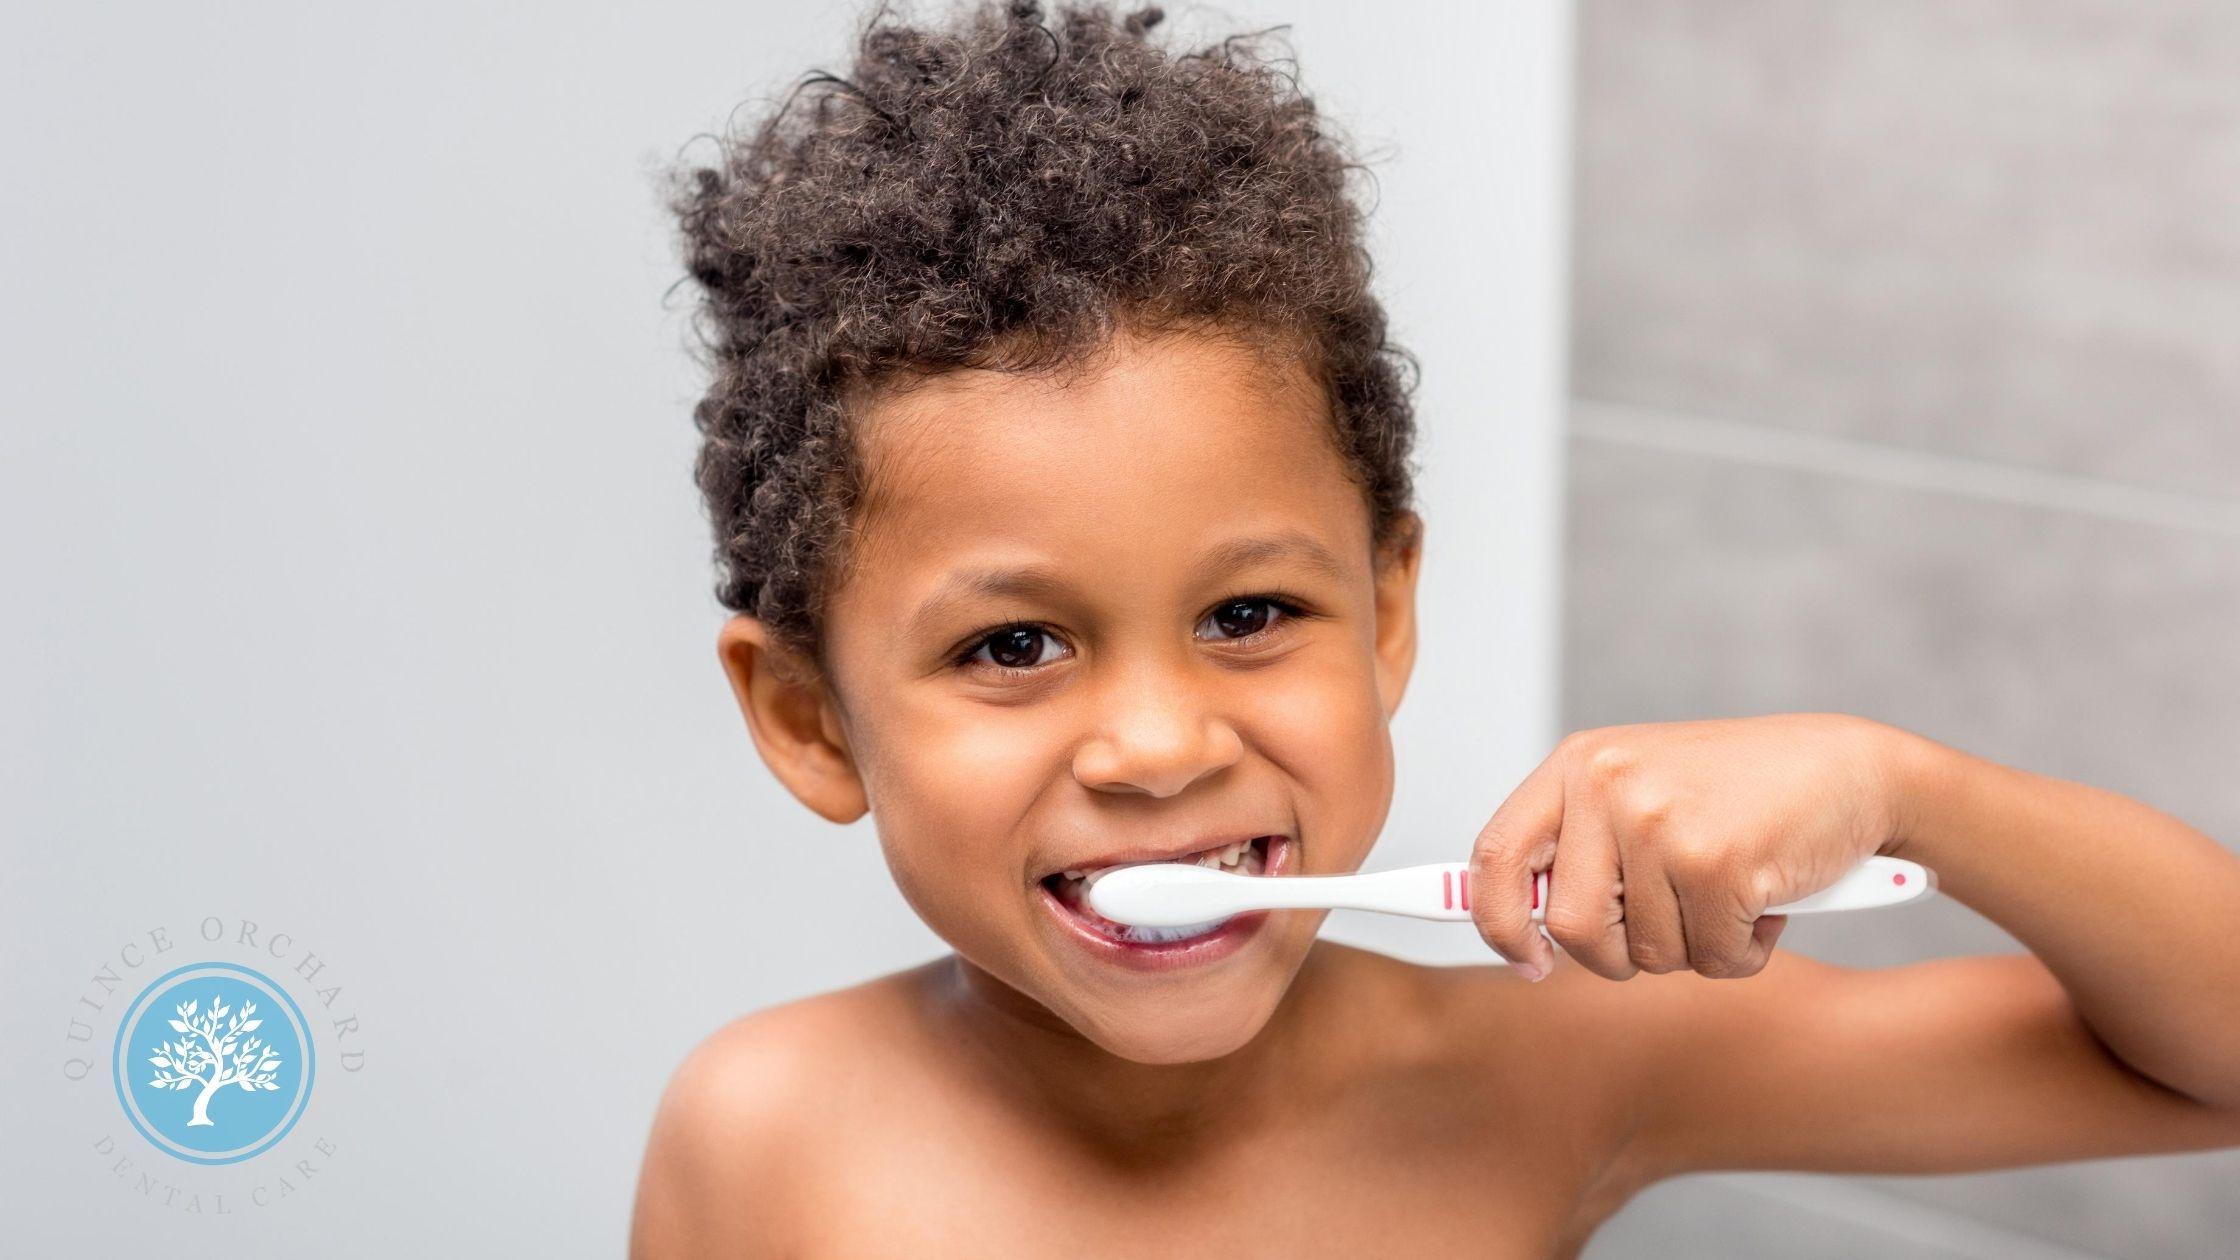 Photo of boy brushing his teeth